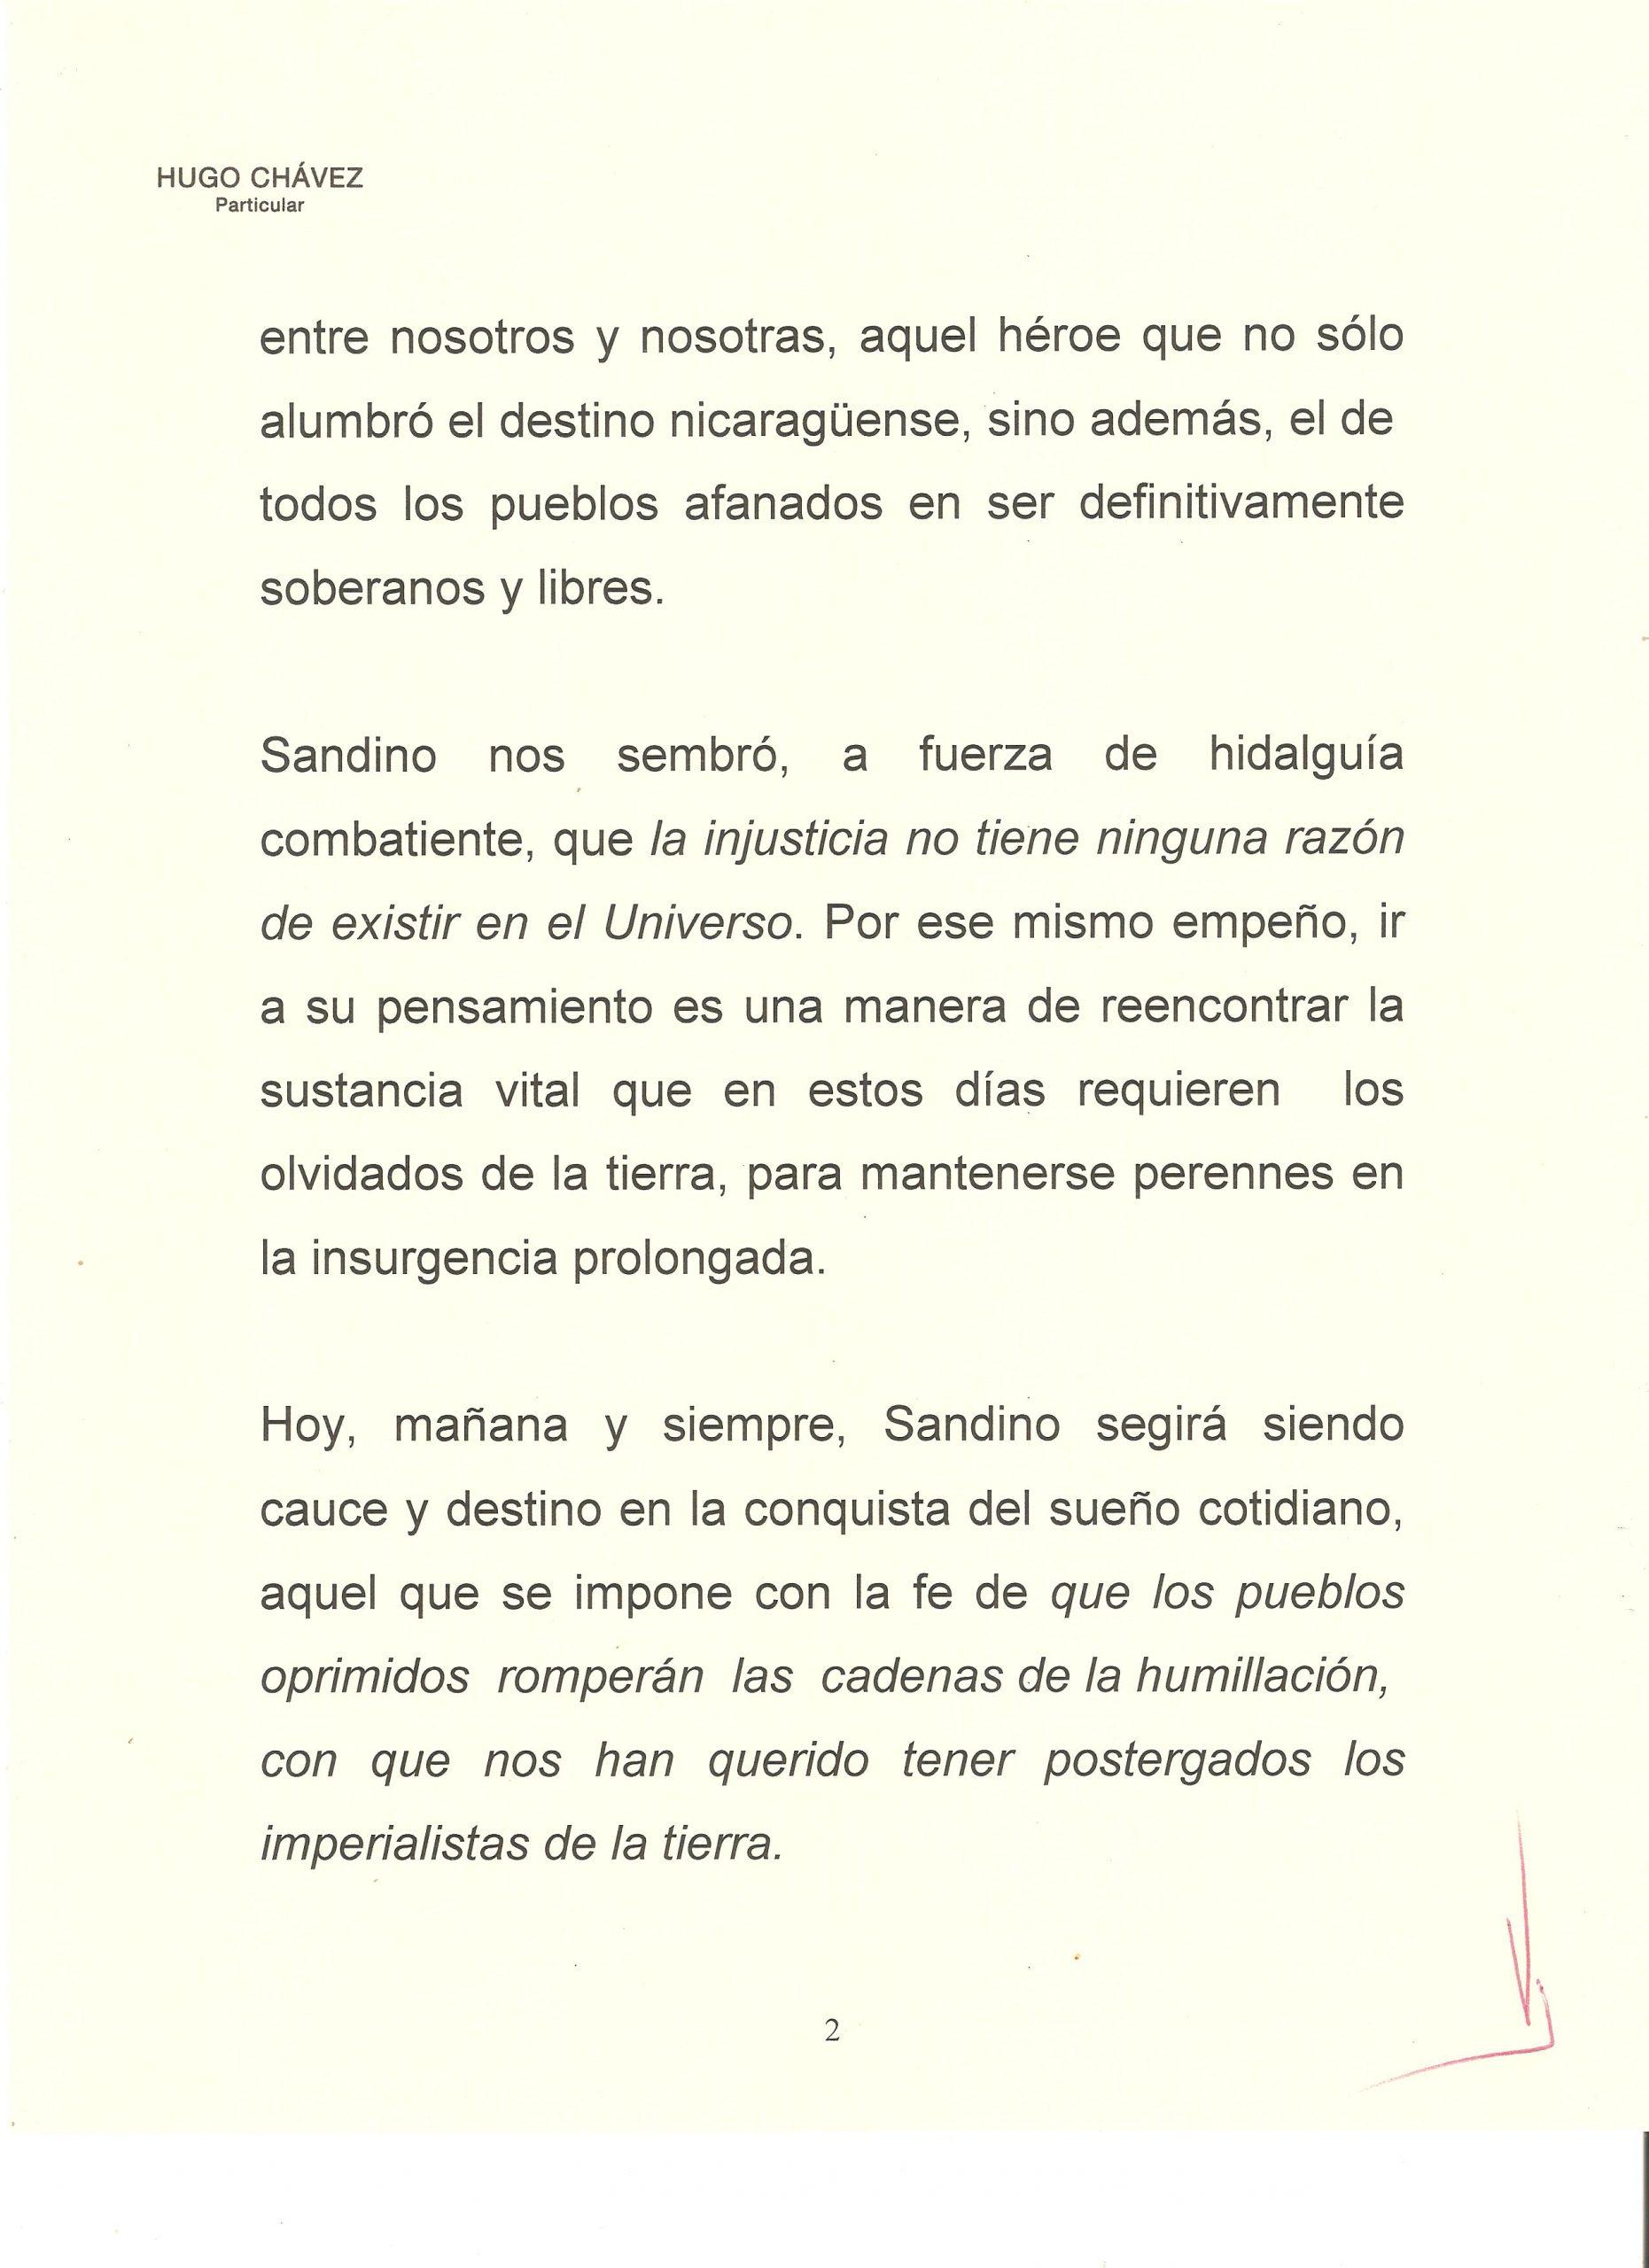 PROLOGO DE HUGO CHAVEZ A WALTER 2